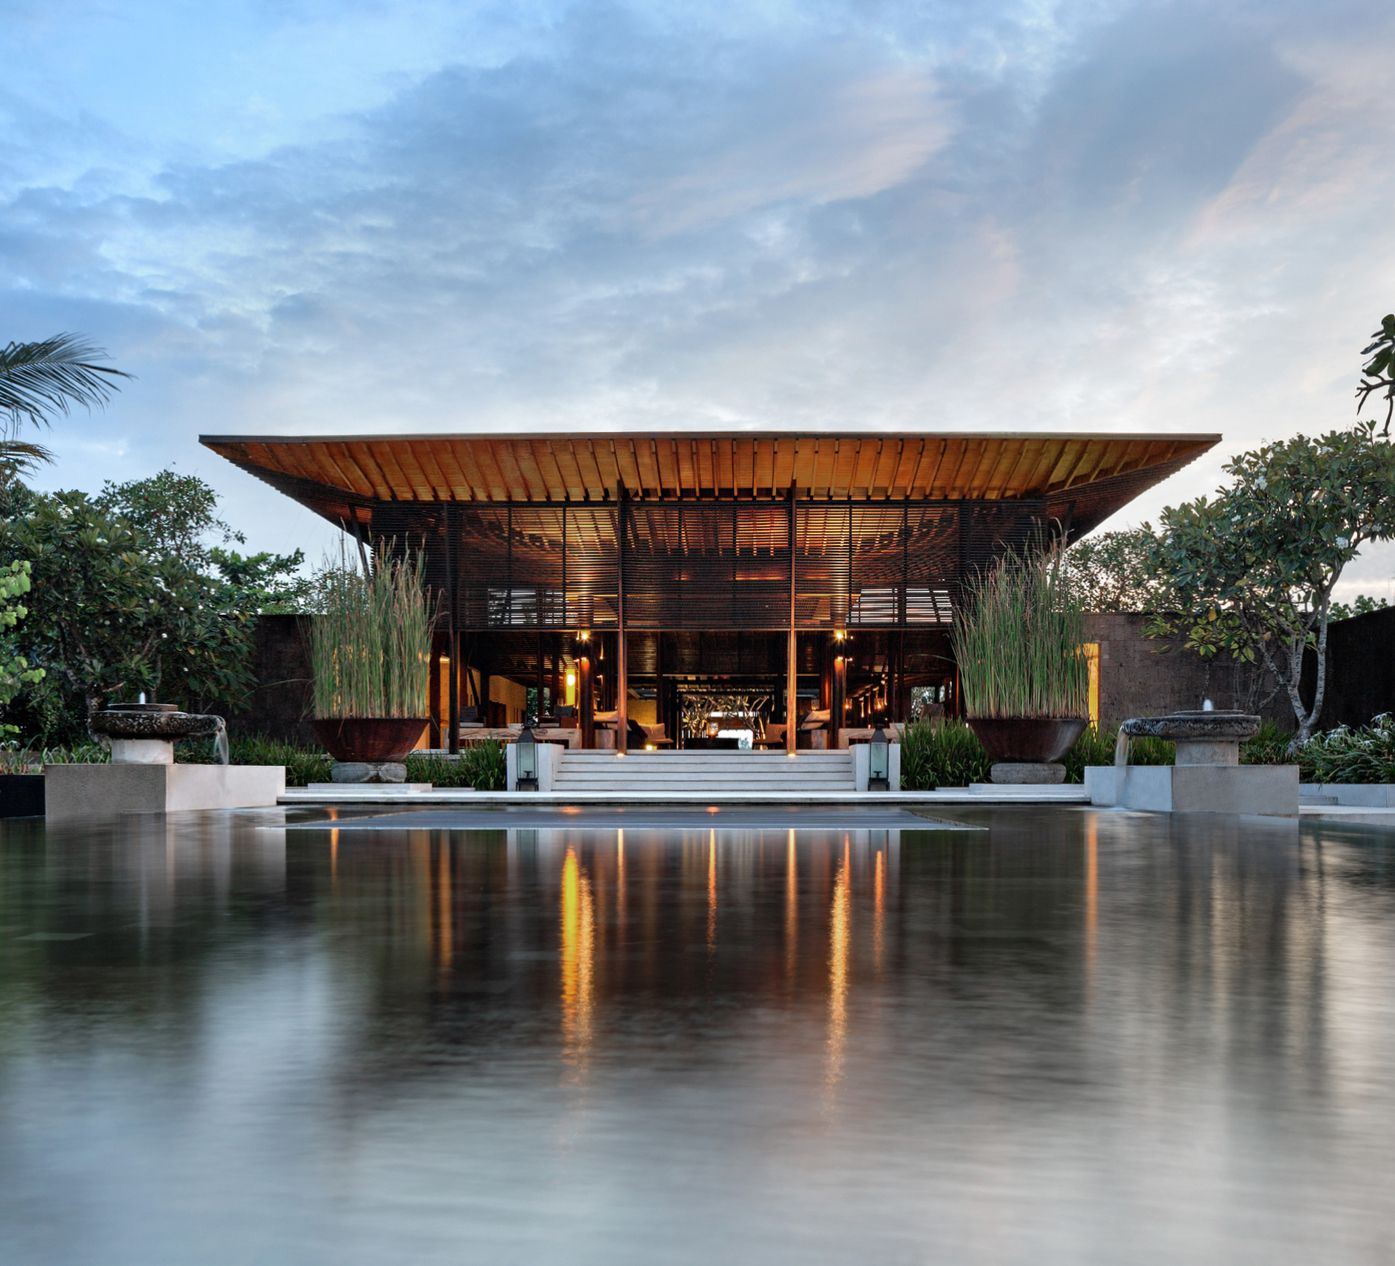 Soori bali scda architects scda architects architects for Prefab tropical homes